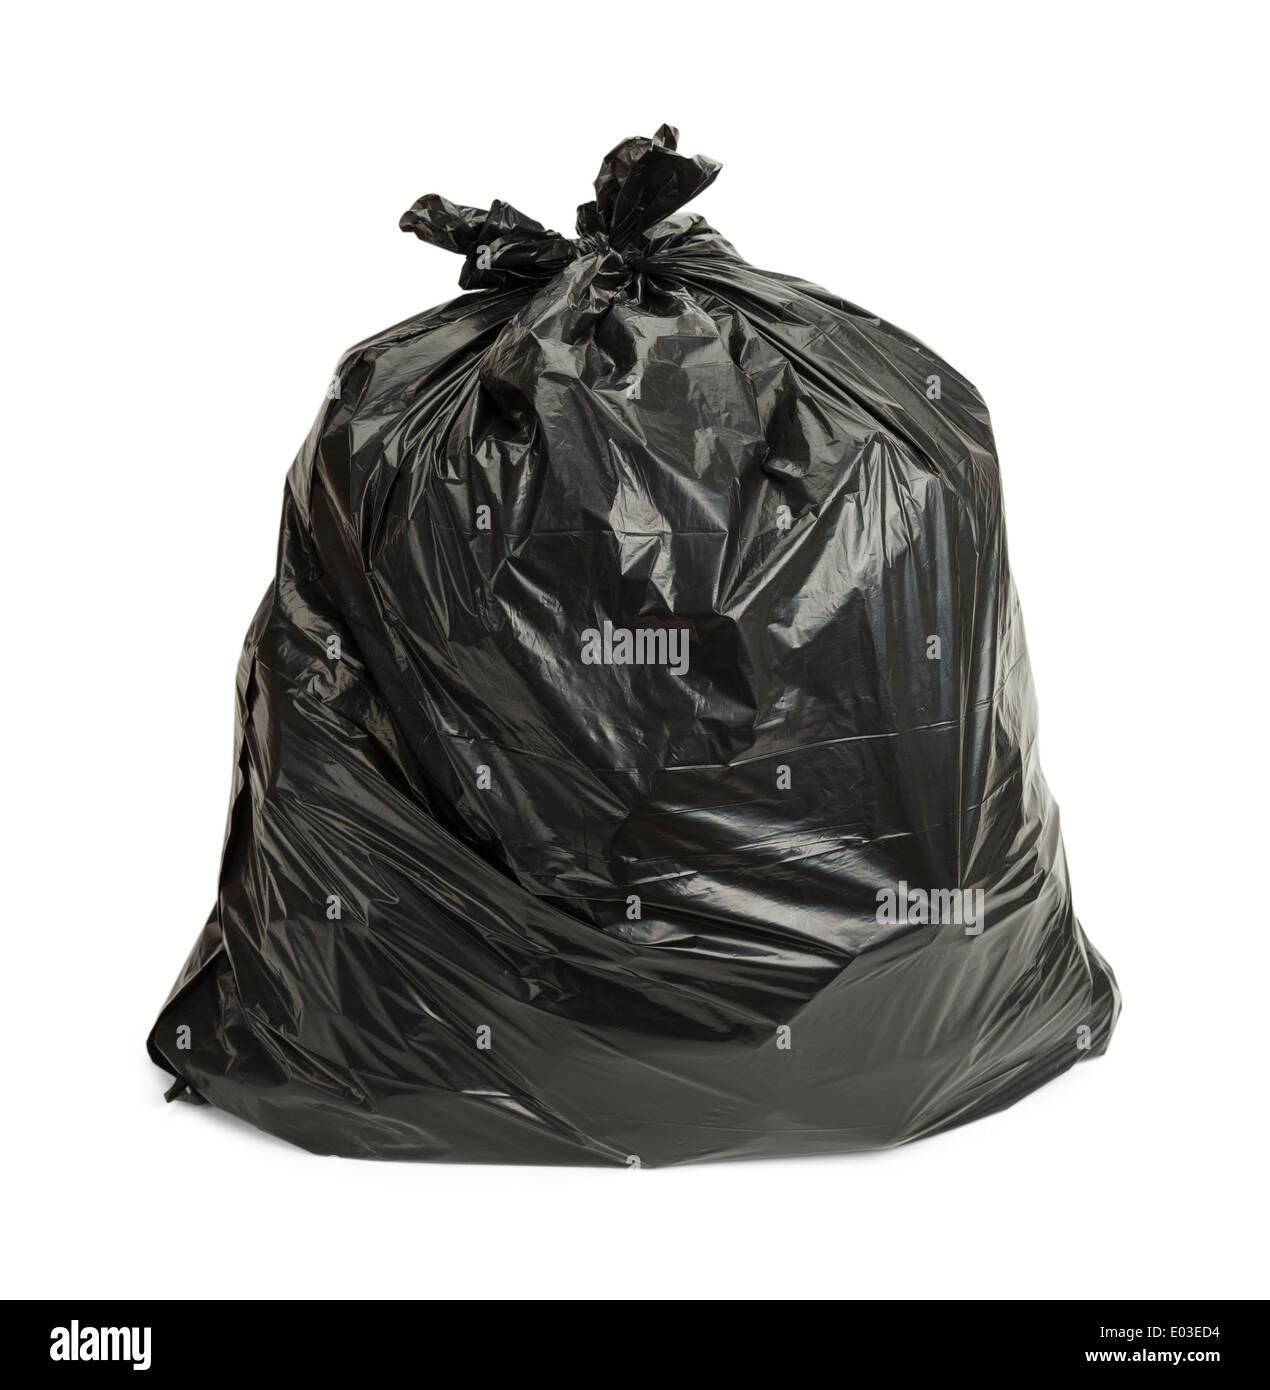 Sac poubelle plein isolé sur fond blanc. Photo Stock